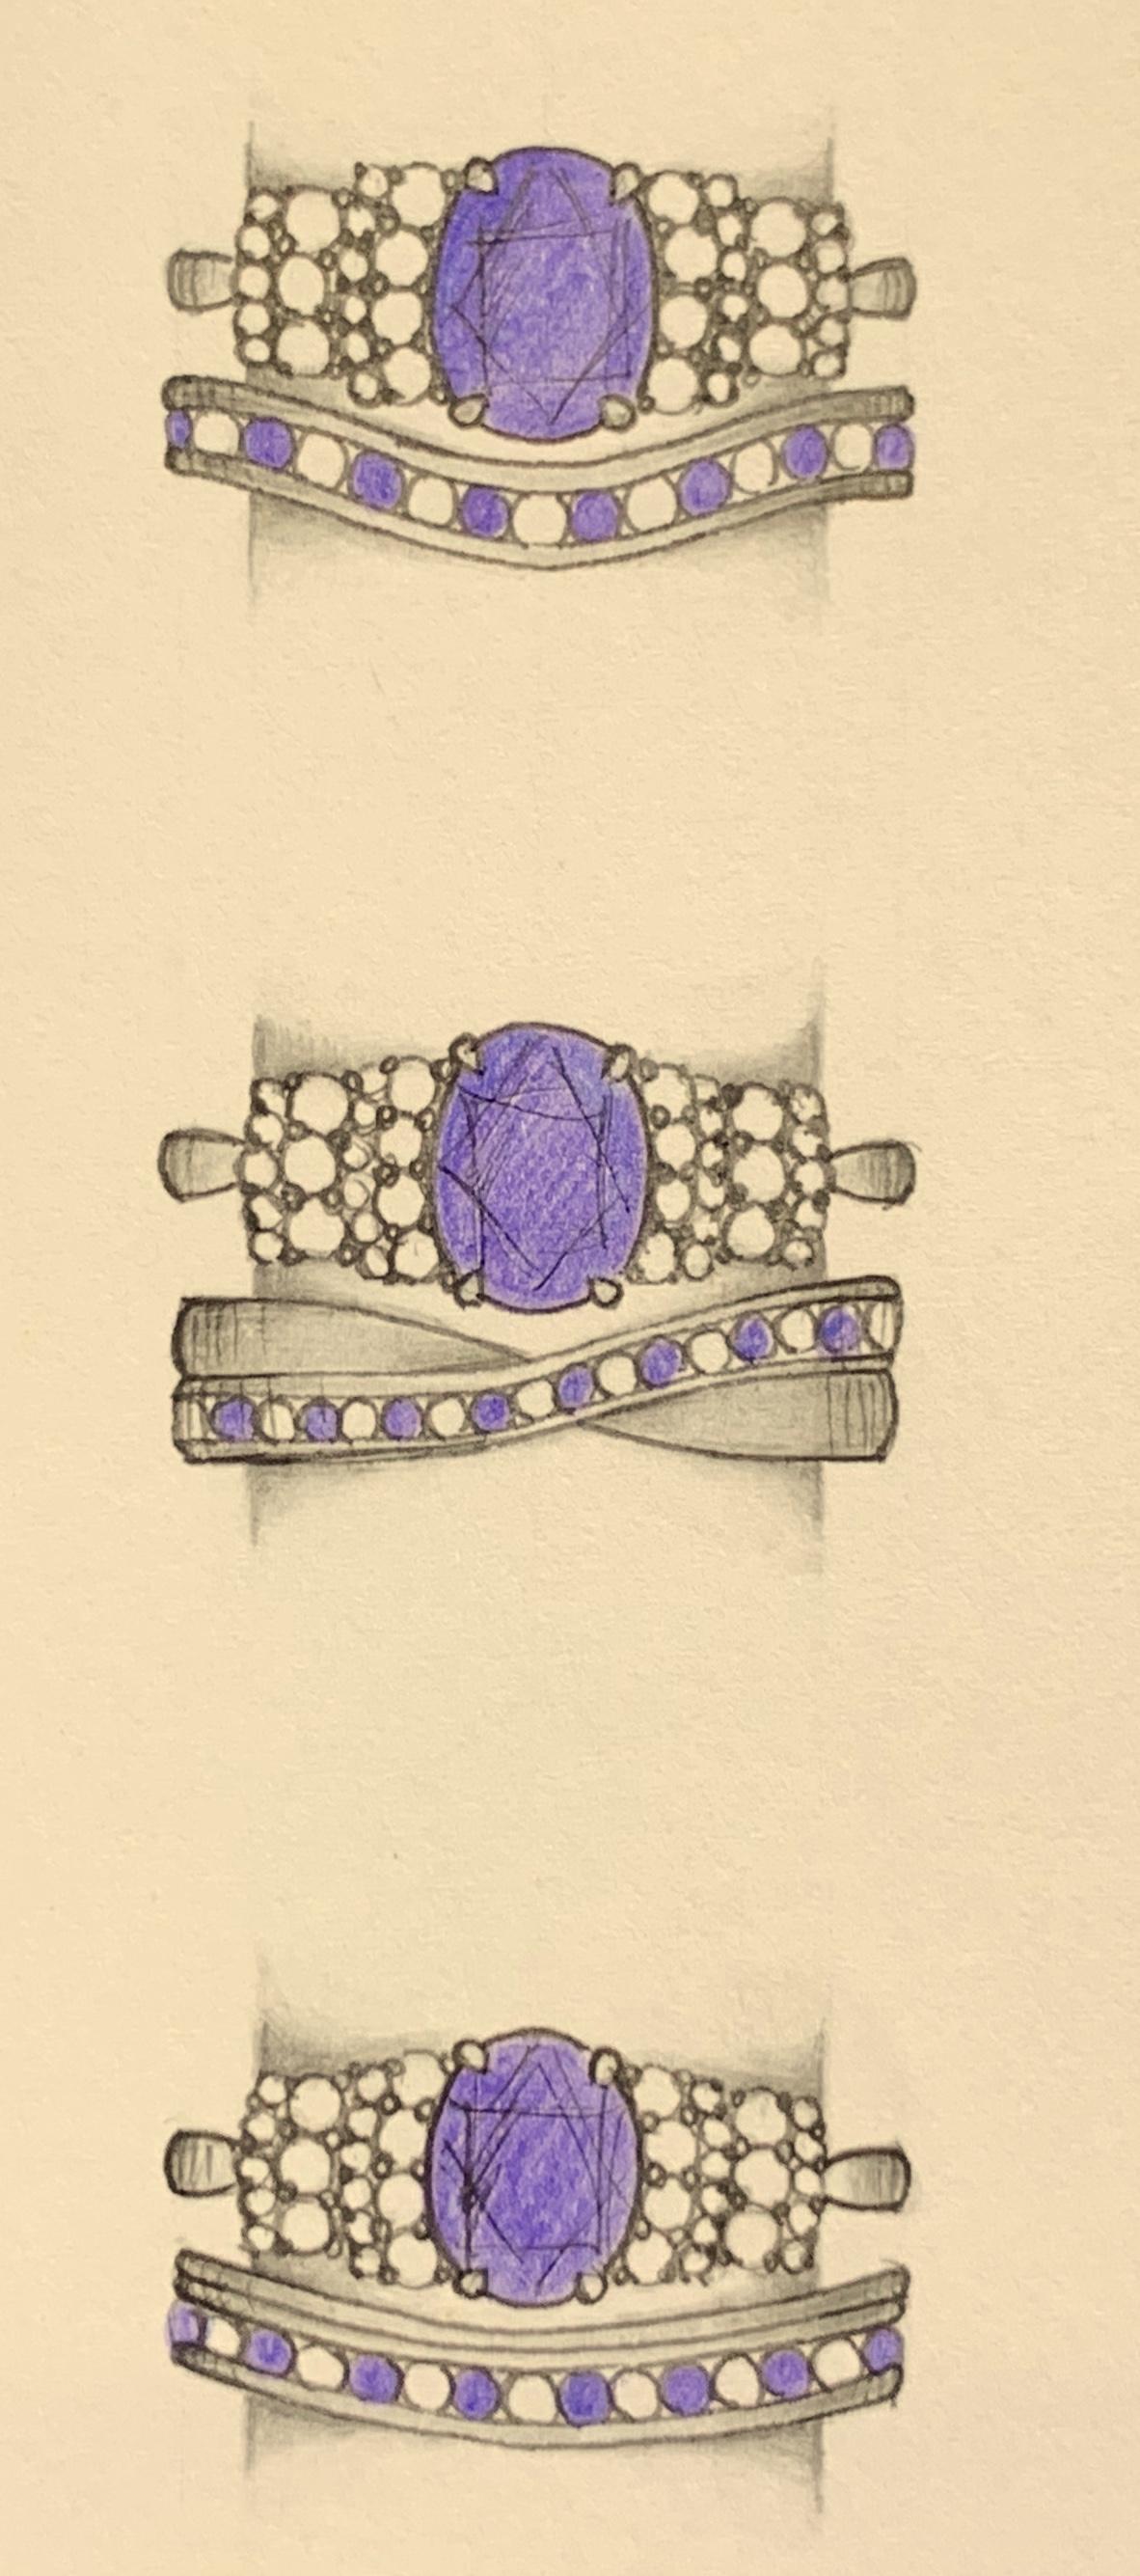 Designs fro a matching shaped diamond and tanzanite set eternity ring.